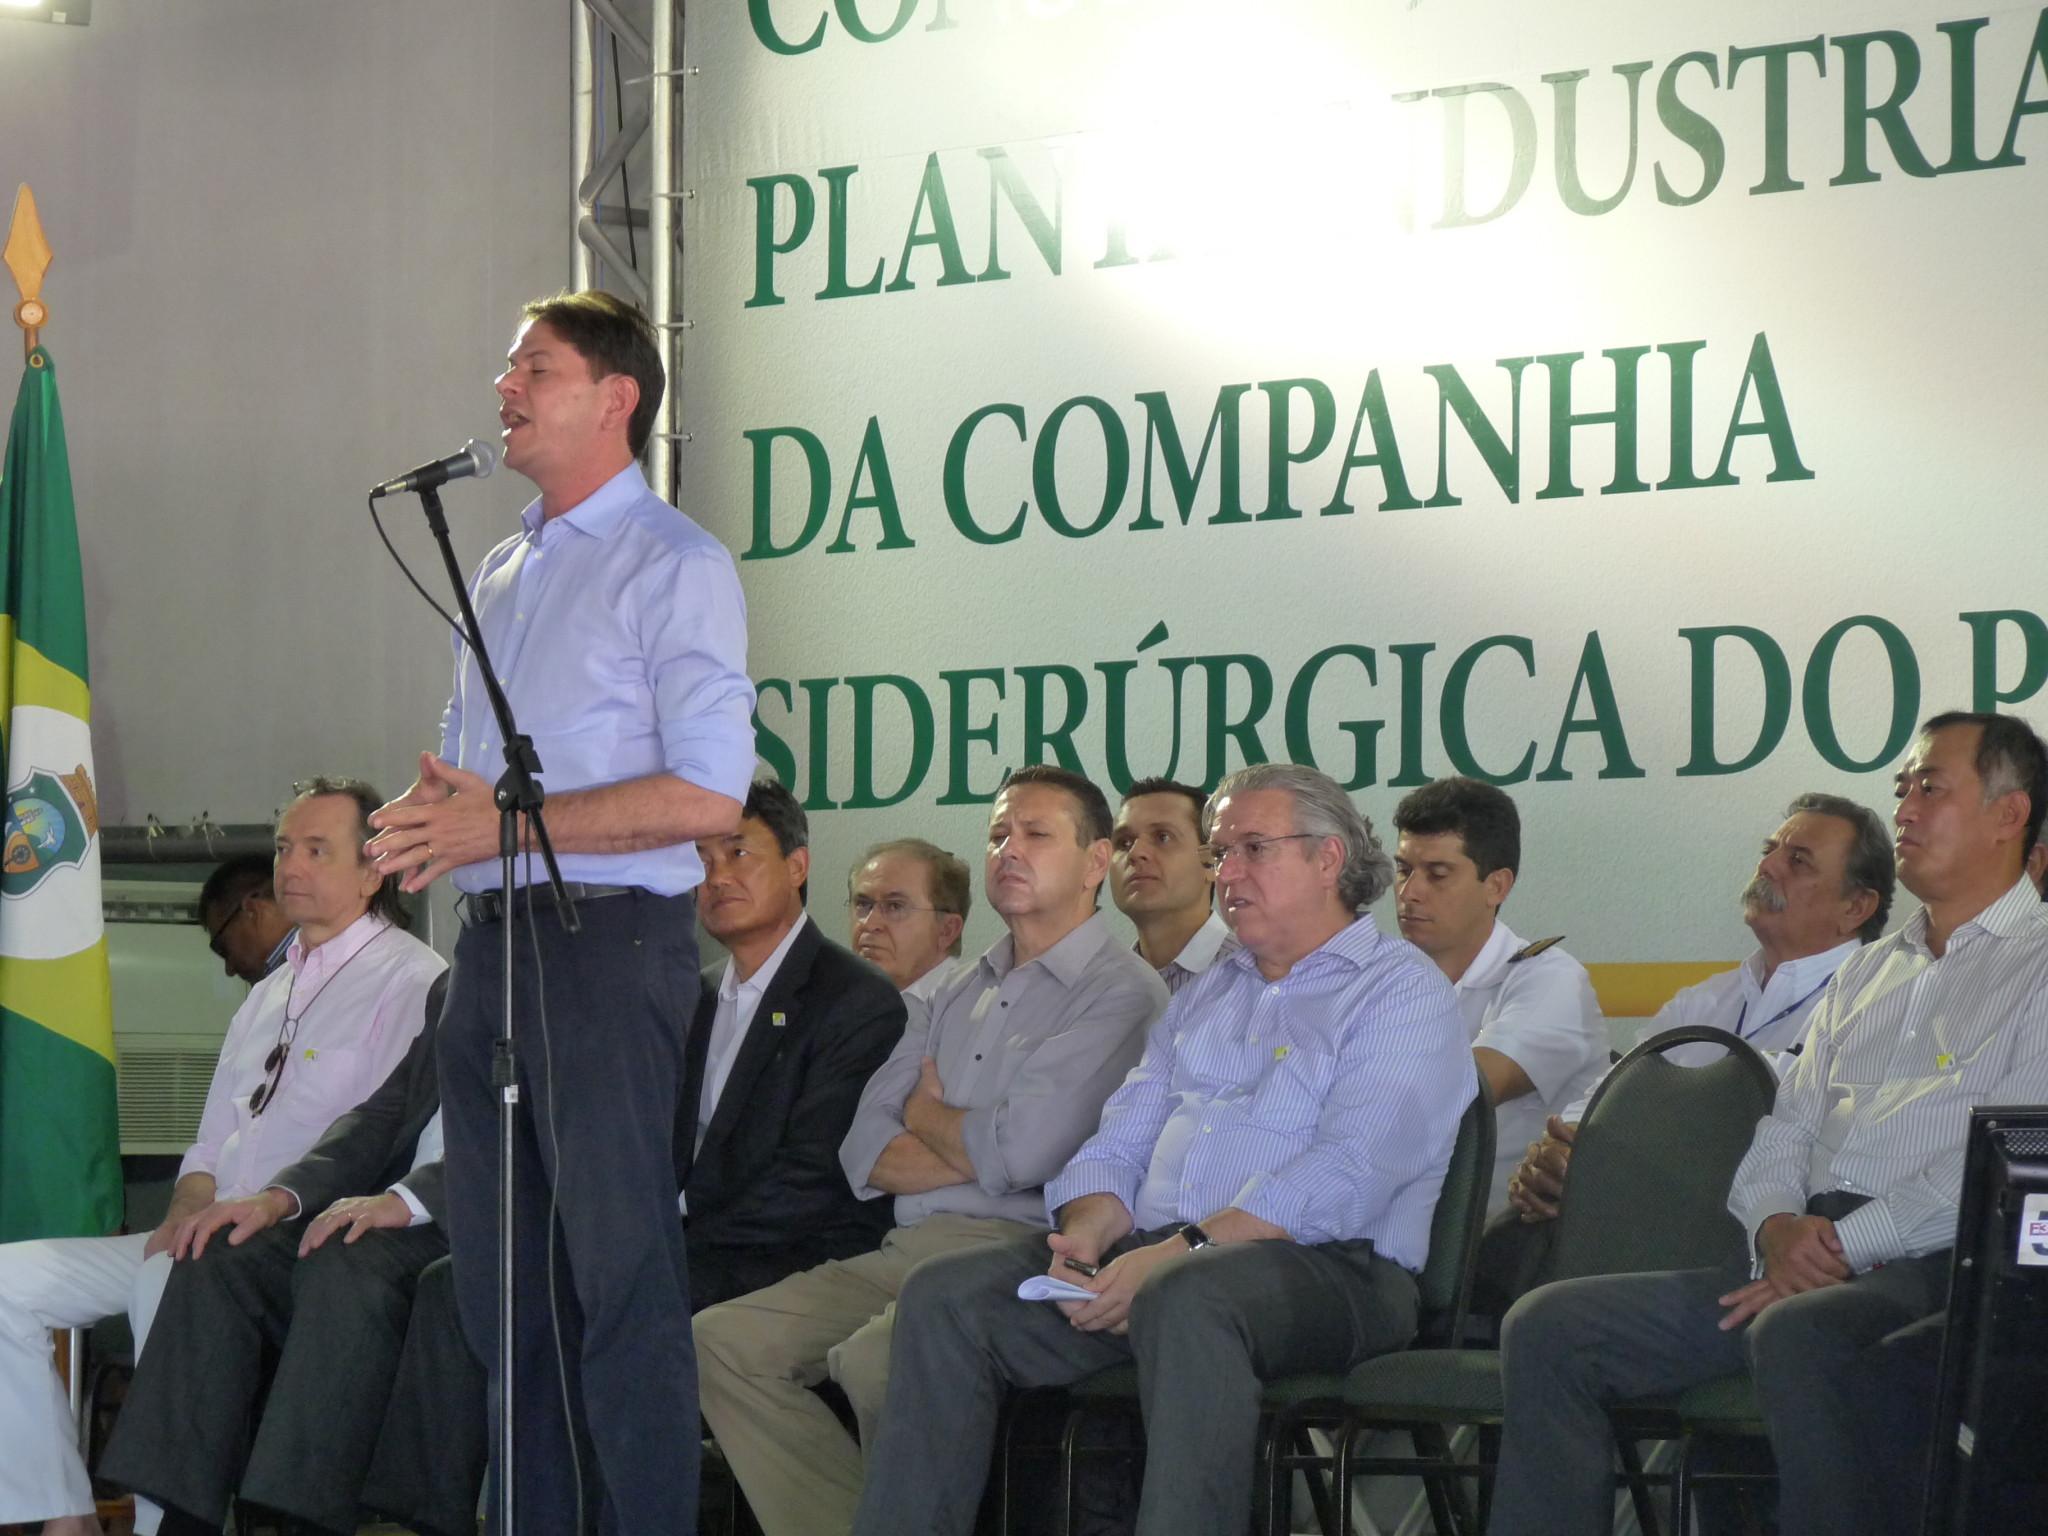 Siderúrgica no Ceará é irreversível